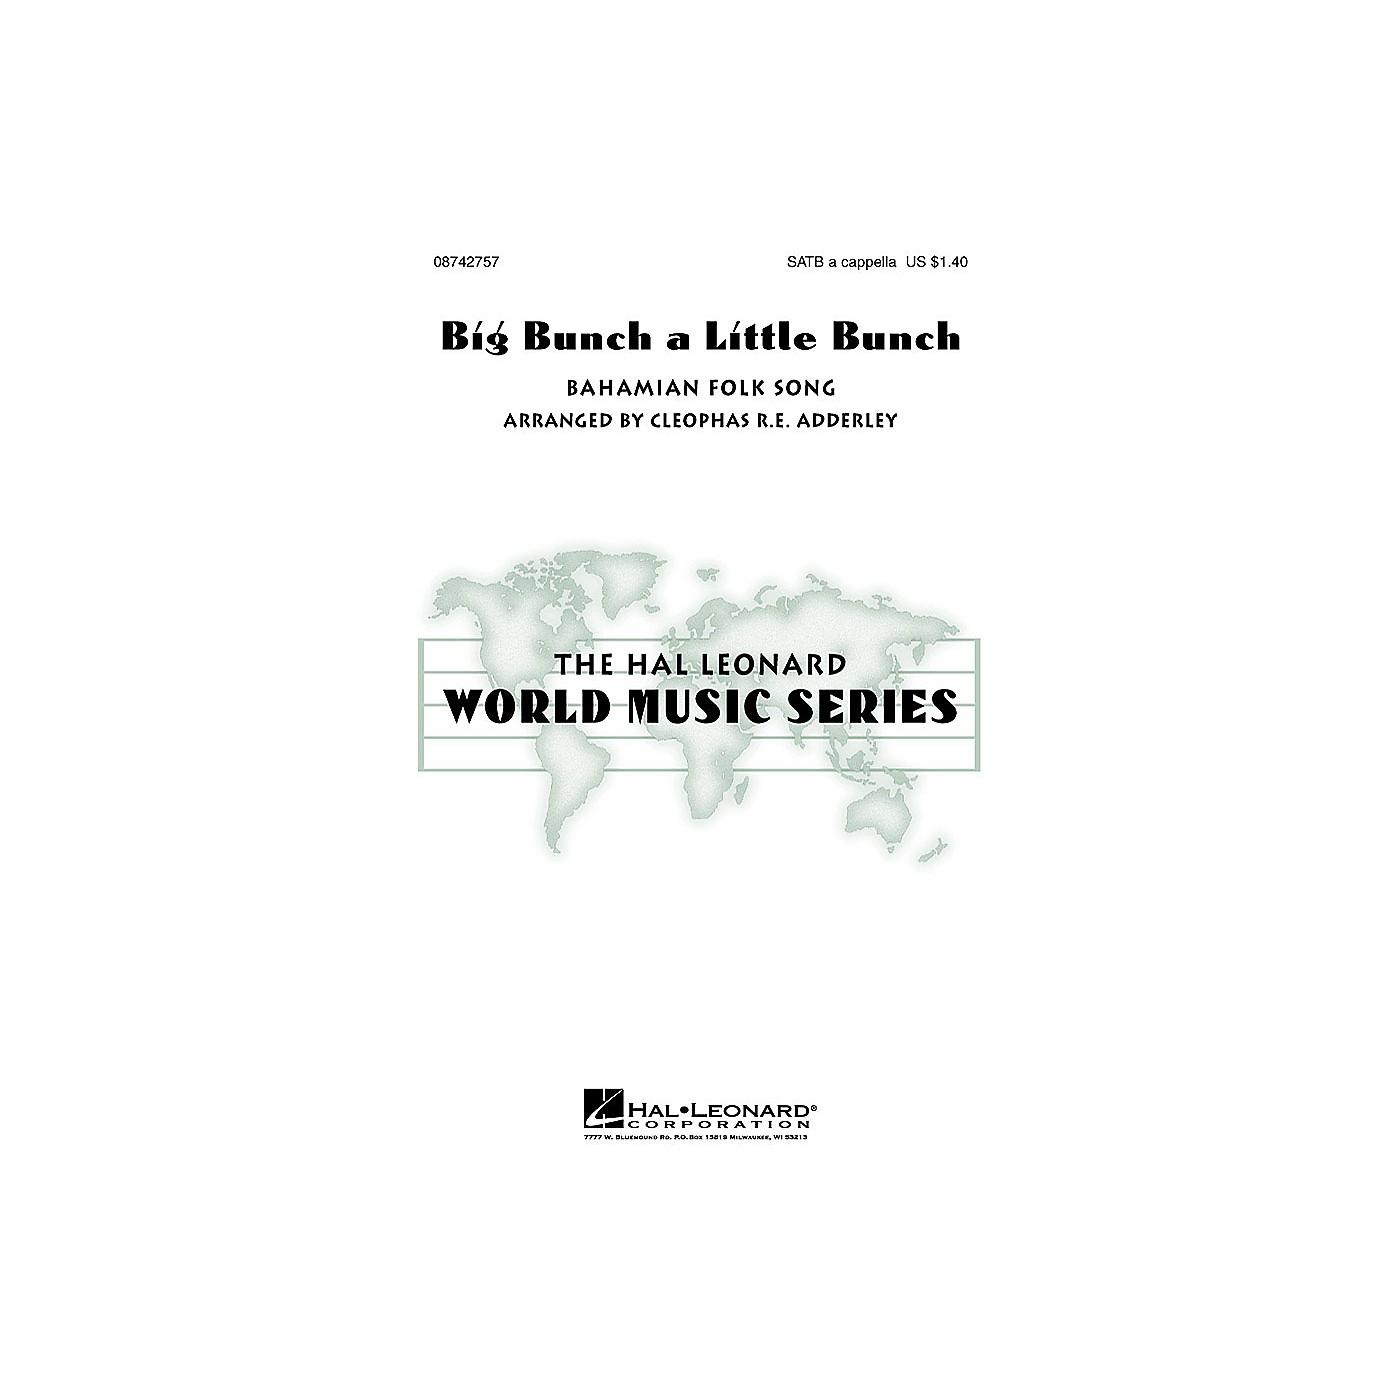 Hal Leonard Big Bunch a Little Bunch SATB a cappella arranged by Cleophas Adderley thumbnail